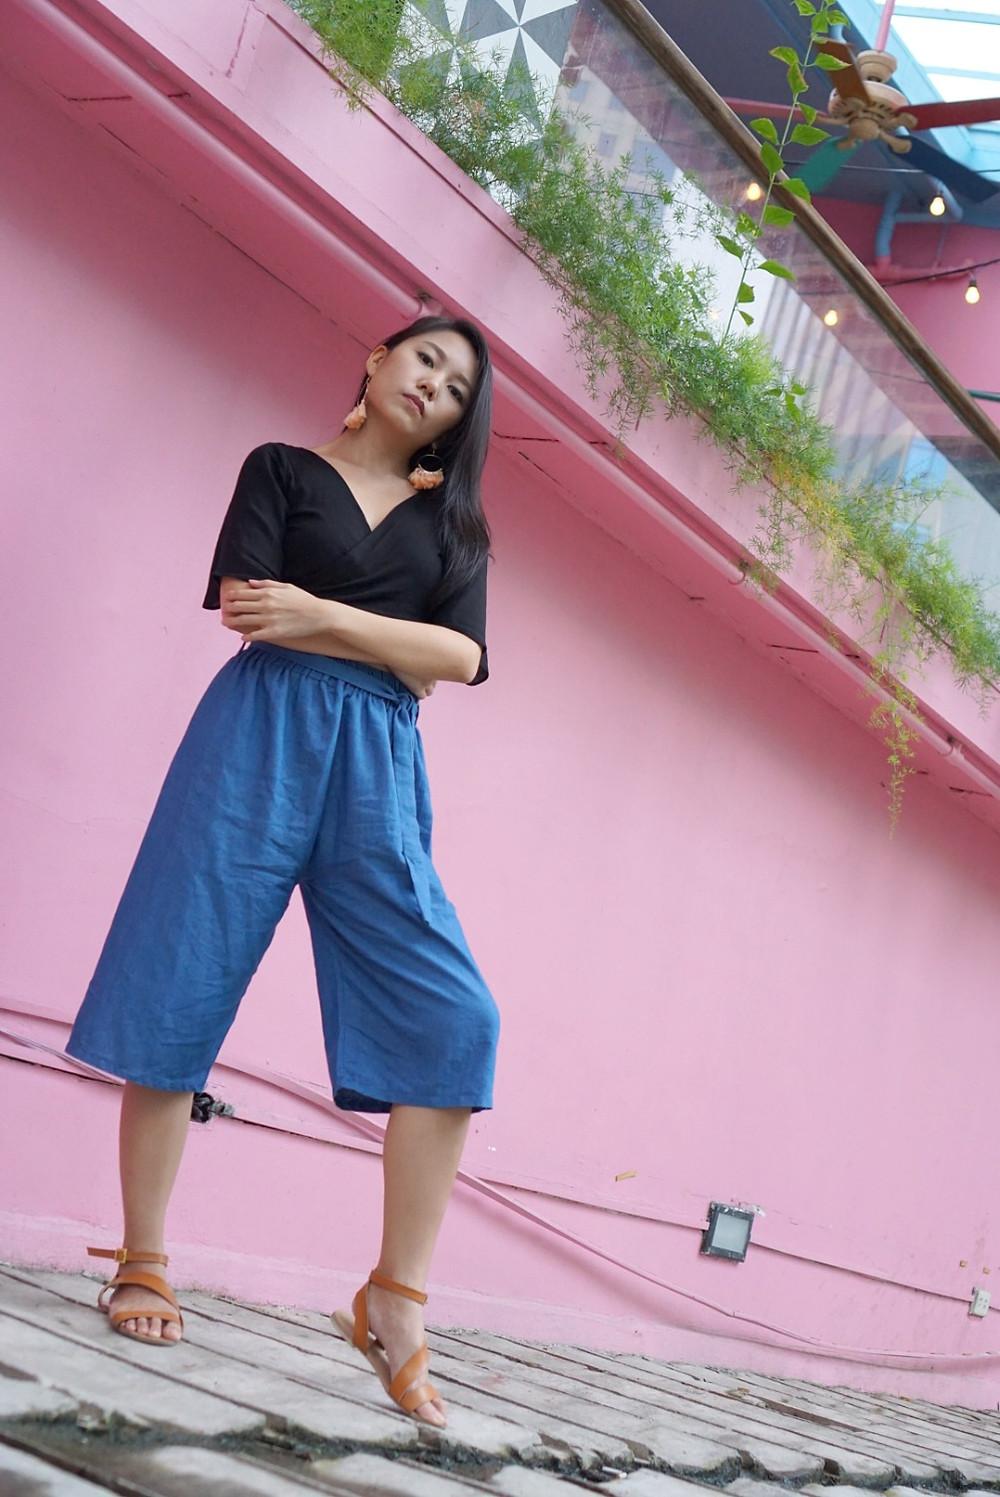 Yabang pose